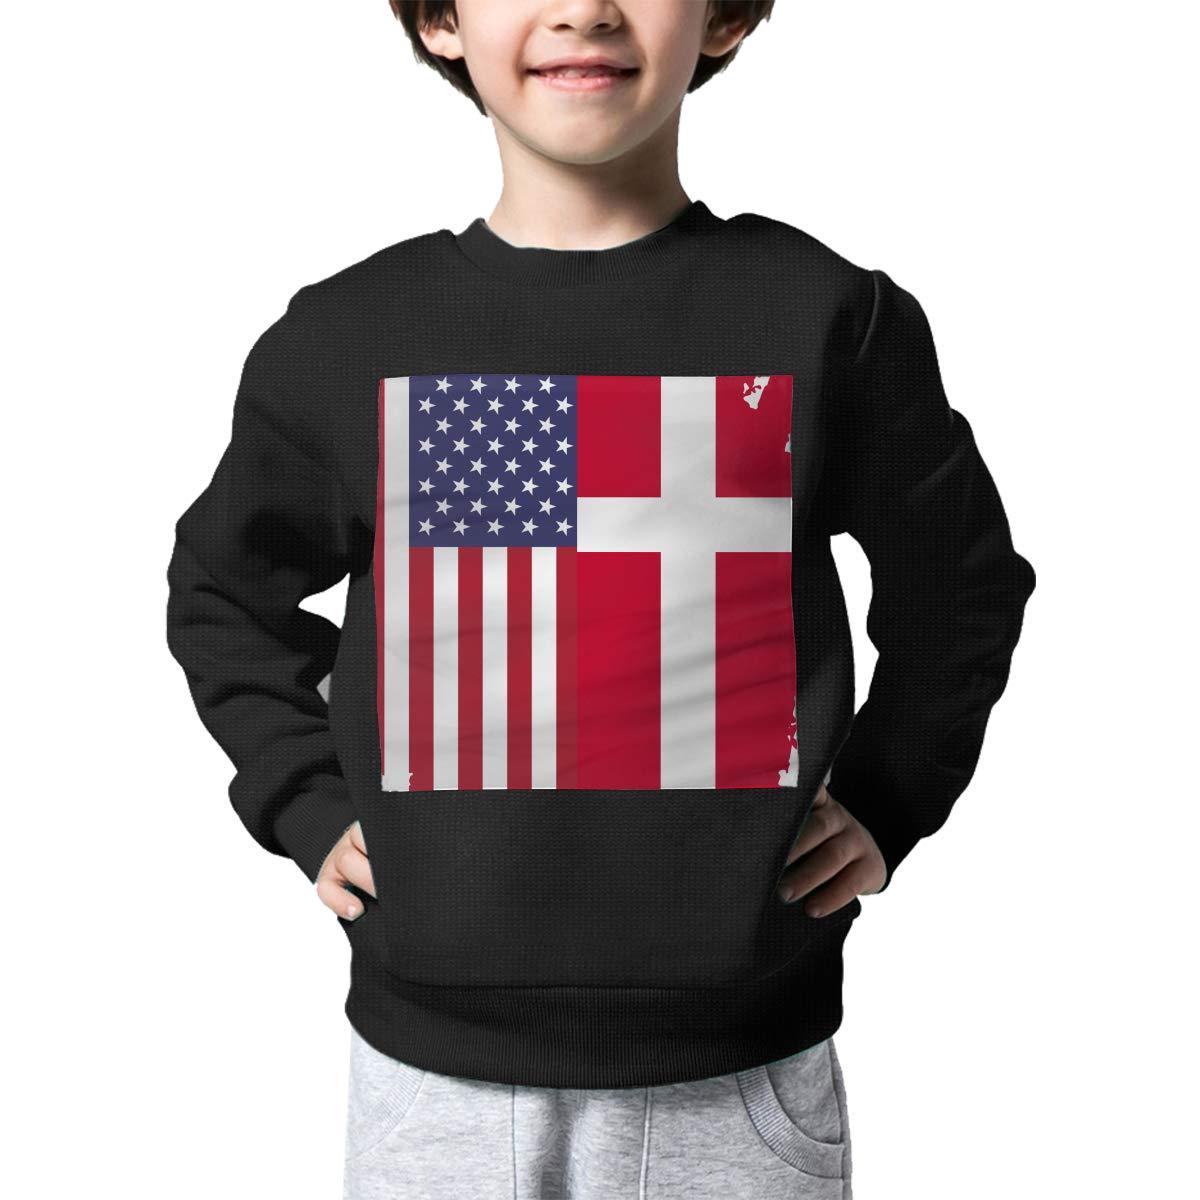 NJKM5MJ Boys Girls American Denmark Flag Lovely Sweaters Soft Warm Childrens Sweater